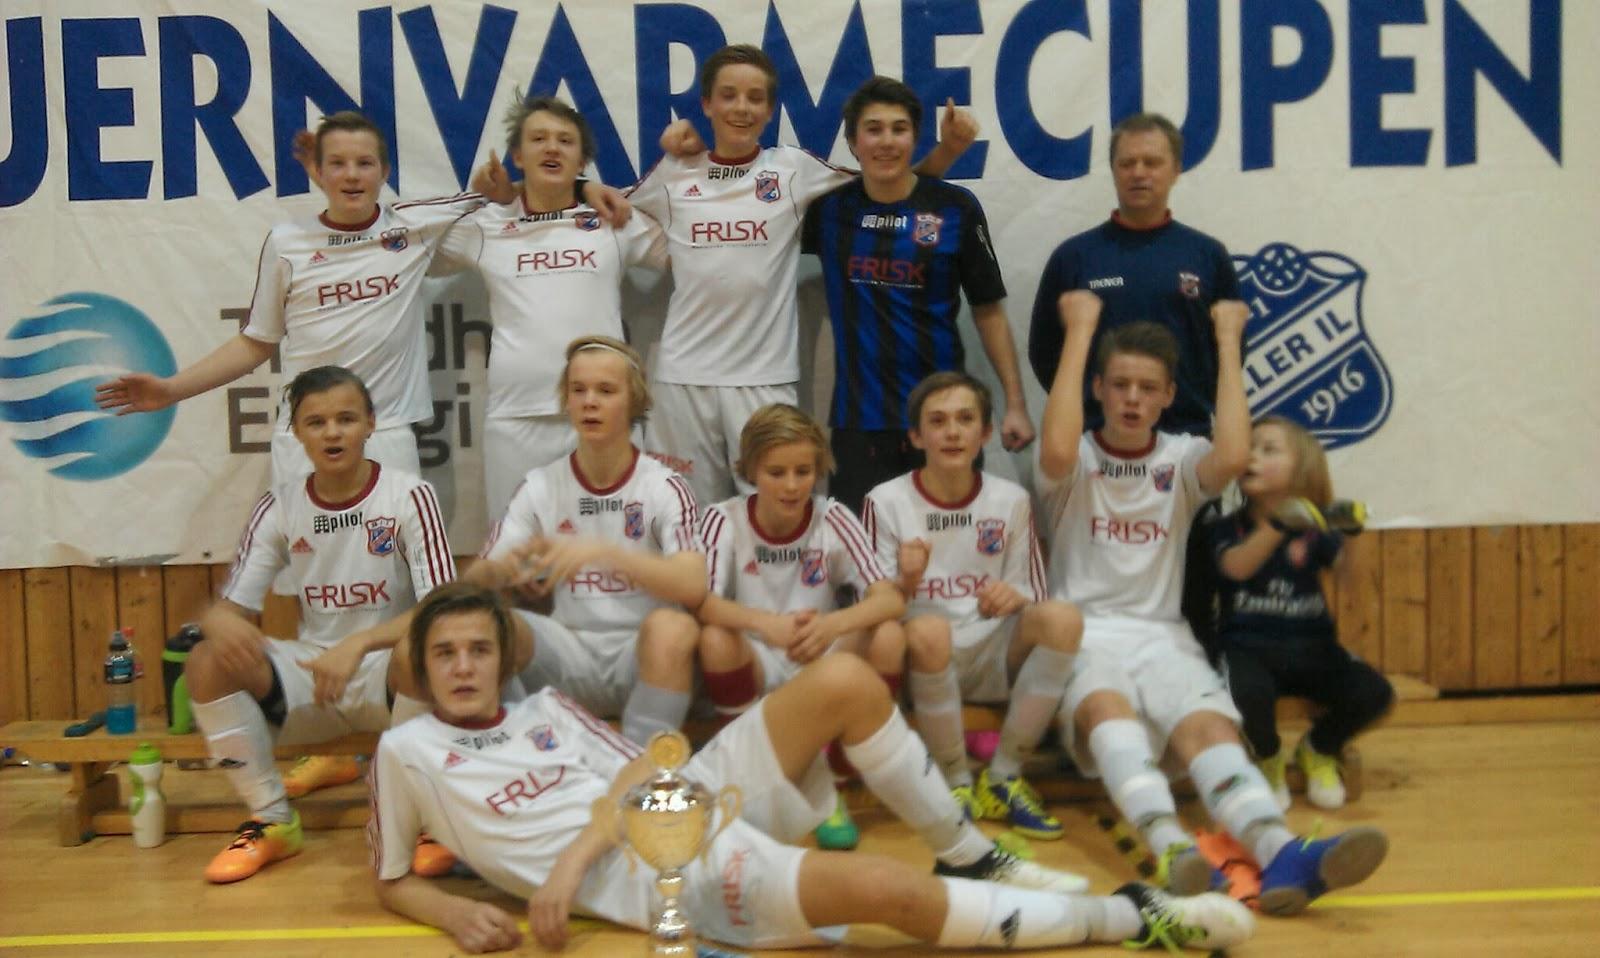 9a1b5be0 Byåsen G 16 vant Fjernvarmecupen klasse G 17